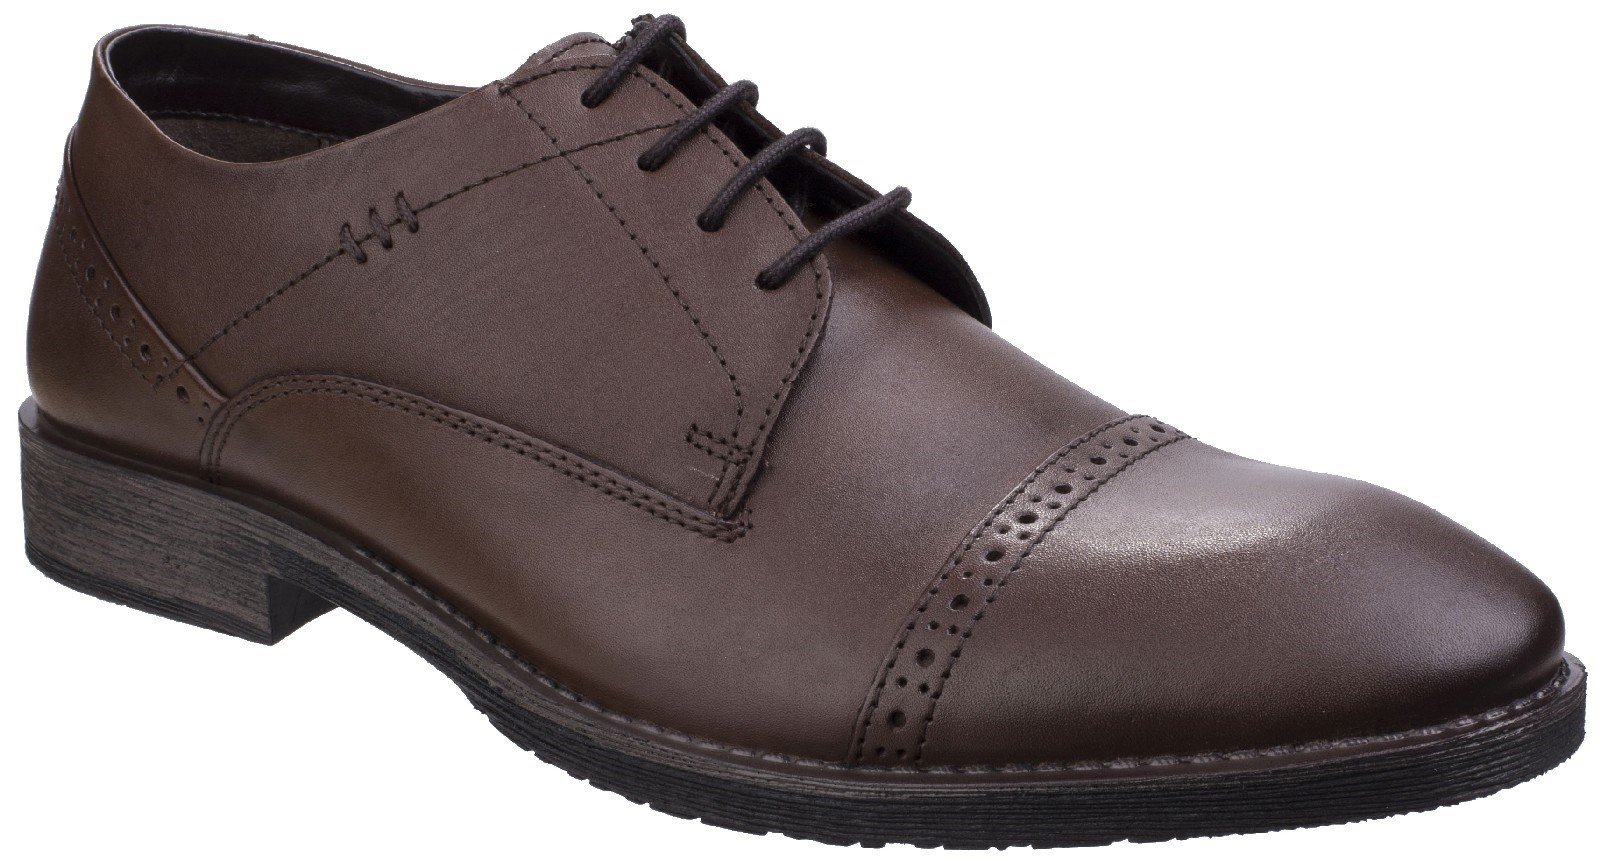 Hush Puppies Men's Craig Luganda Brogue Shoe Brown 25747 - Brown 6